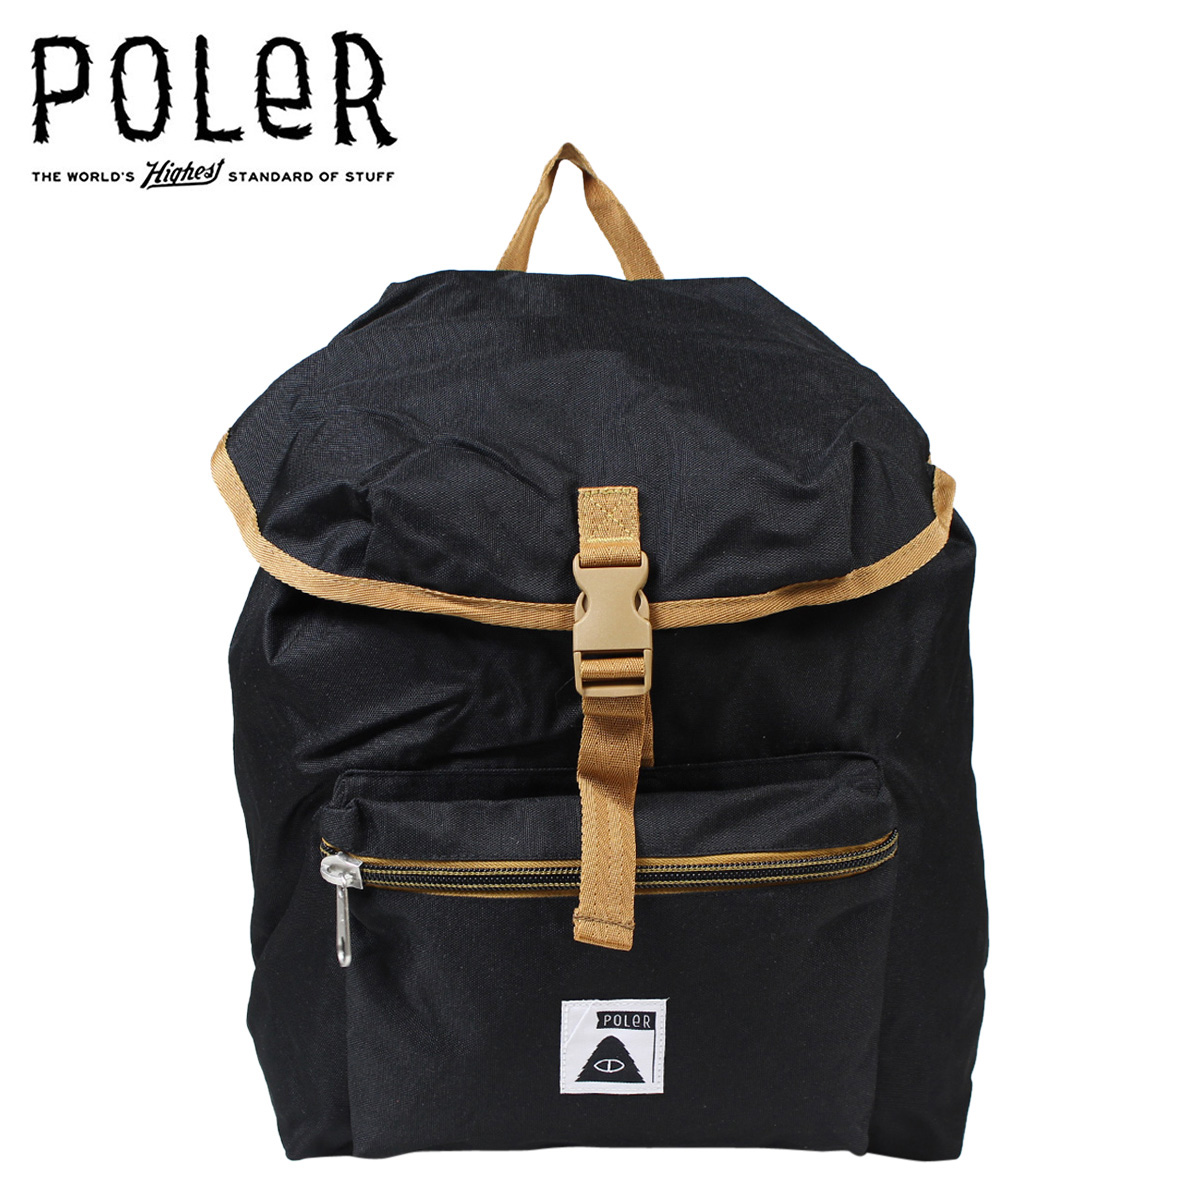 Poler outdoor stuff рюкзак рюкзак-банан